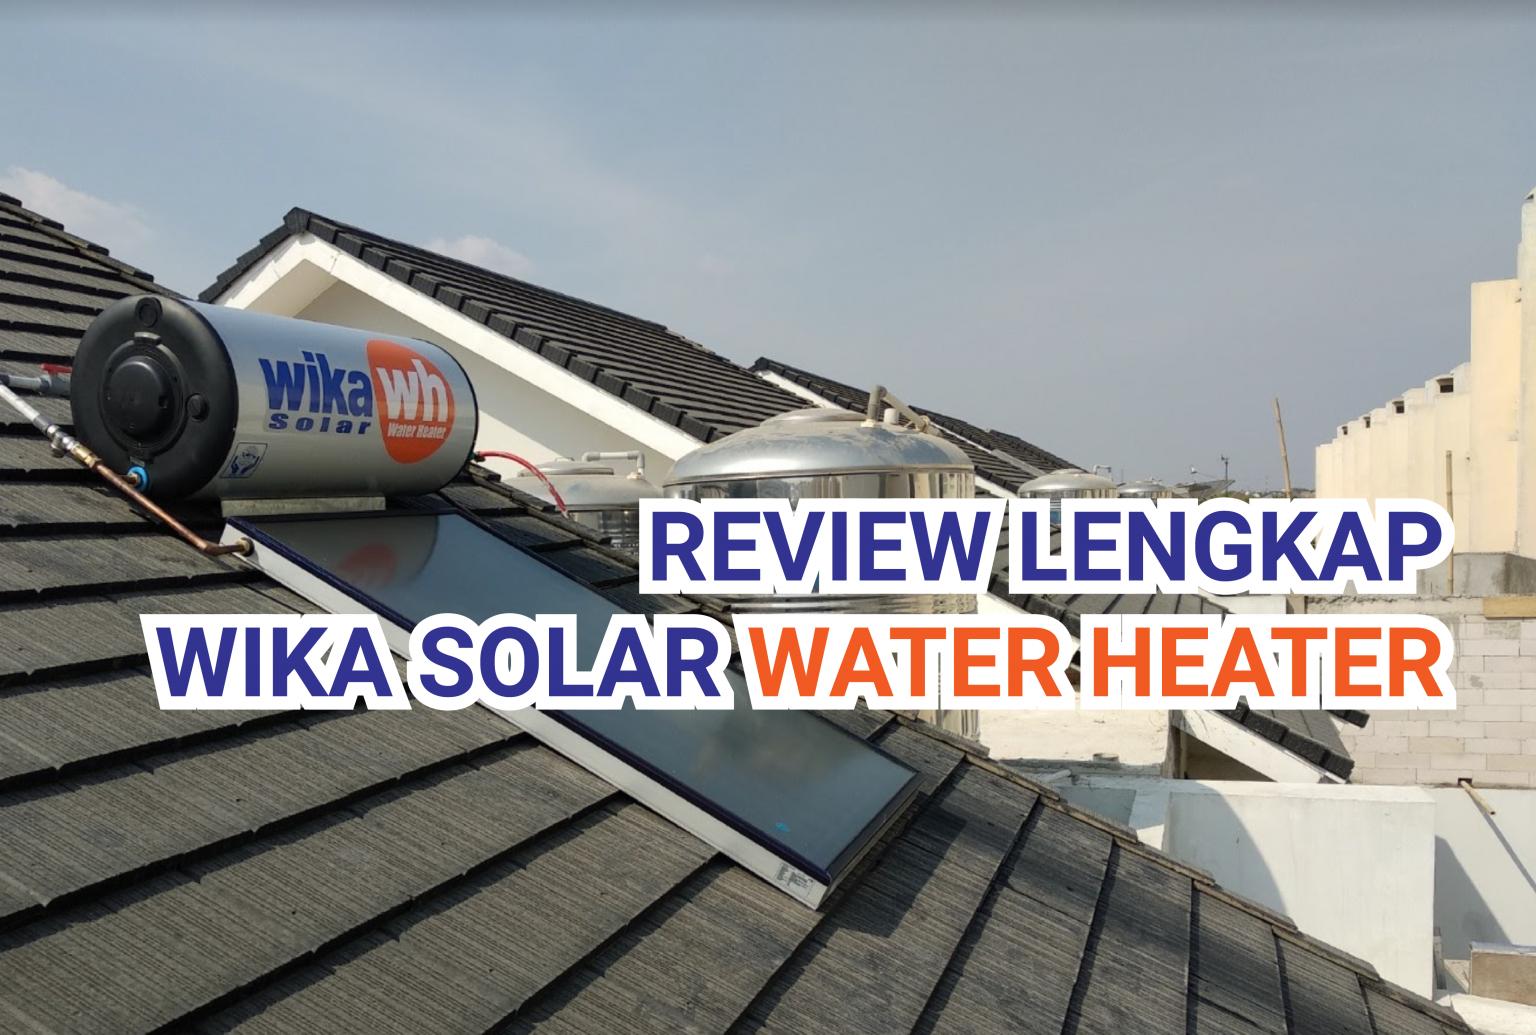 Review Lengkap Wika Solar Water Heater